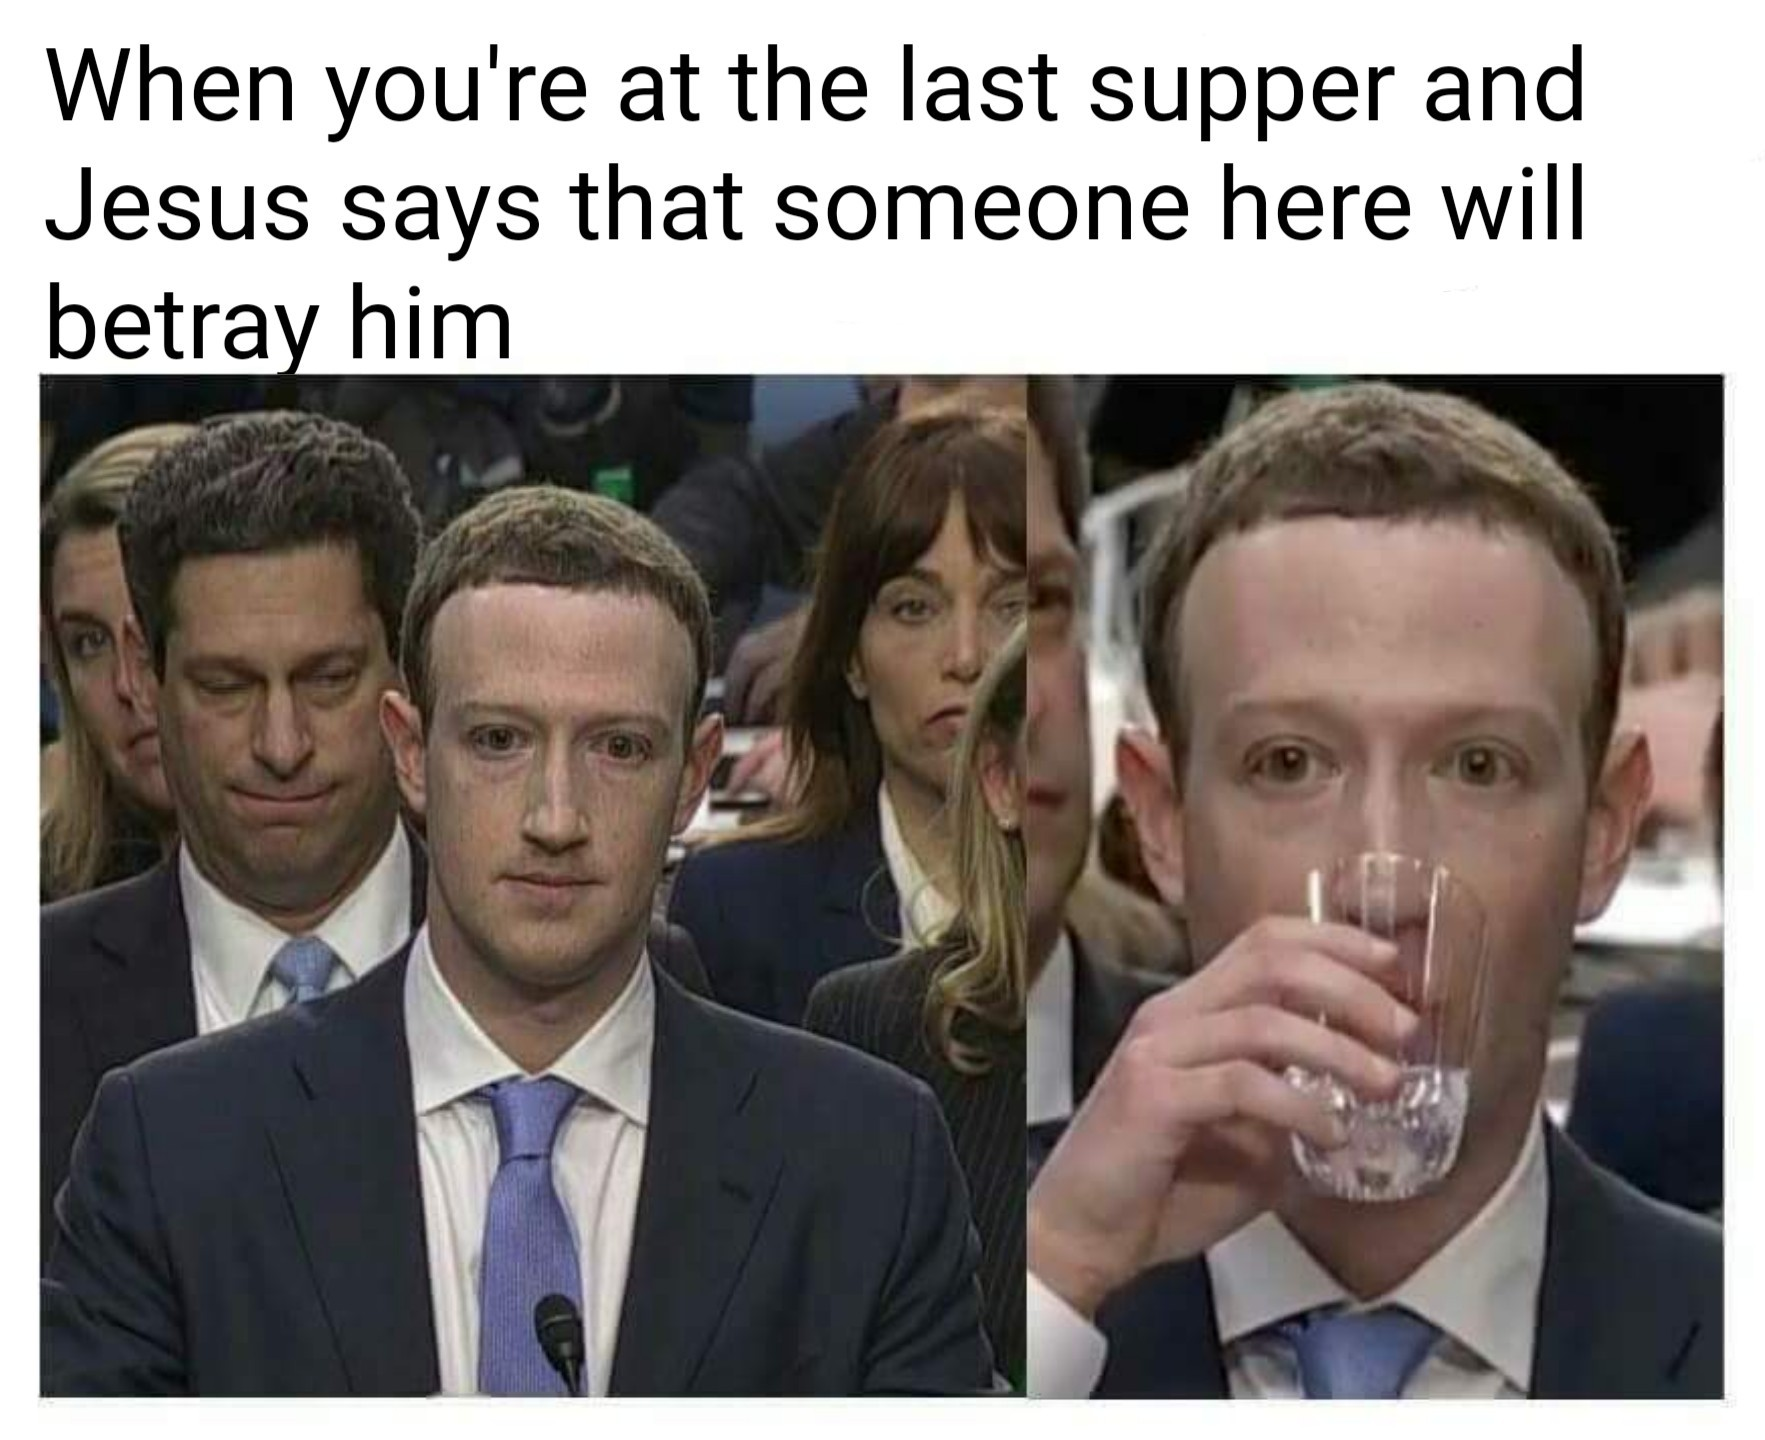 Here comes the zucc - meme